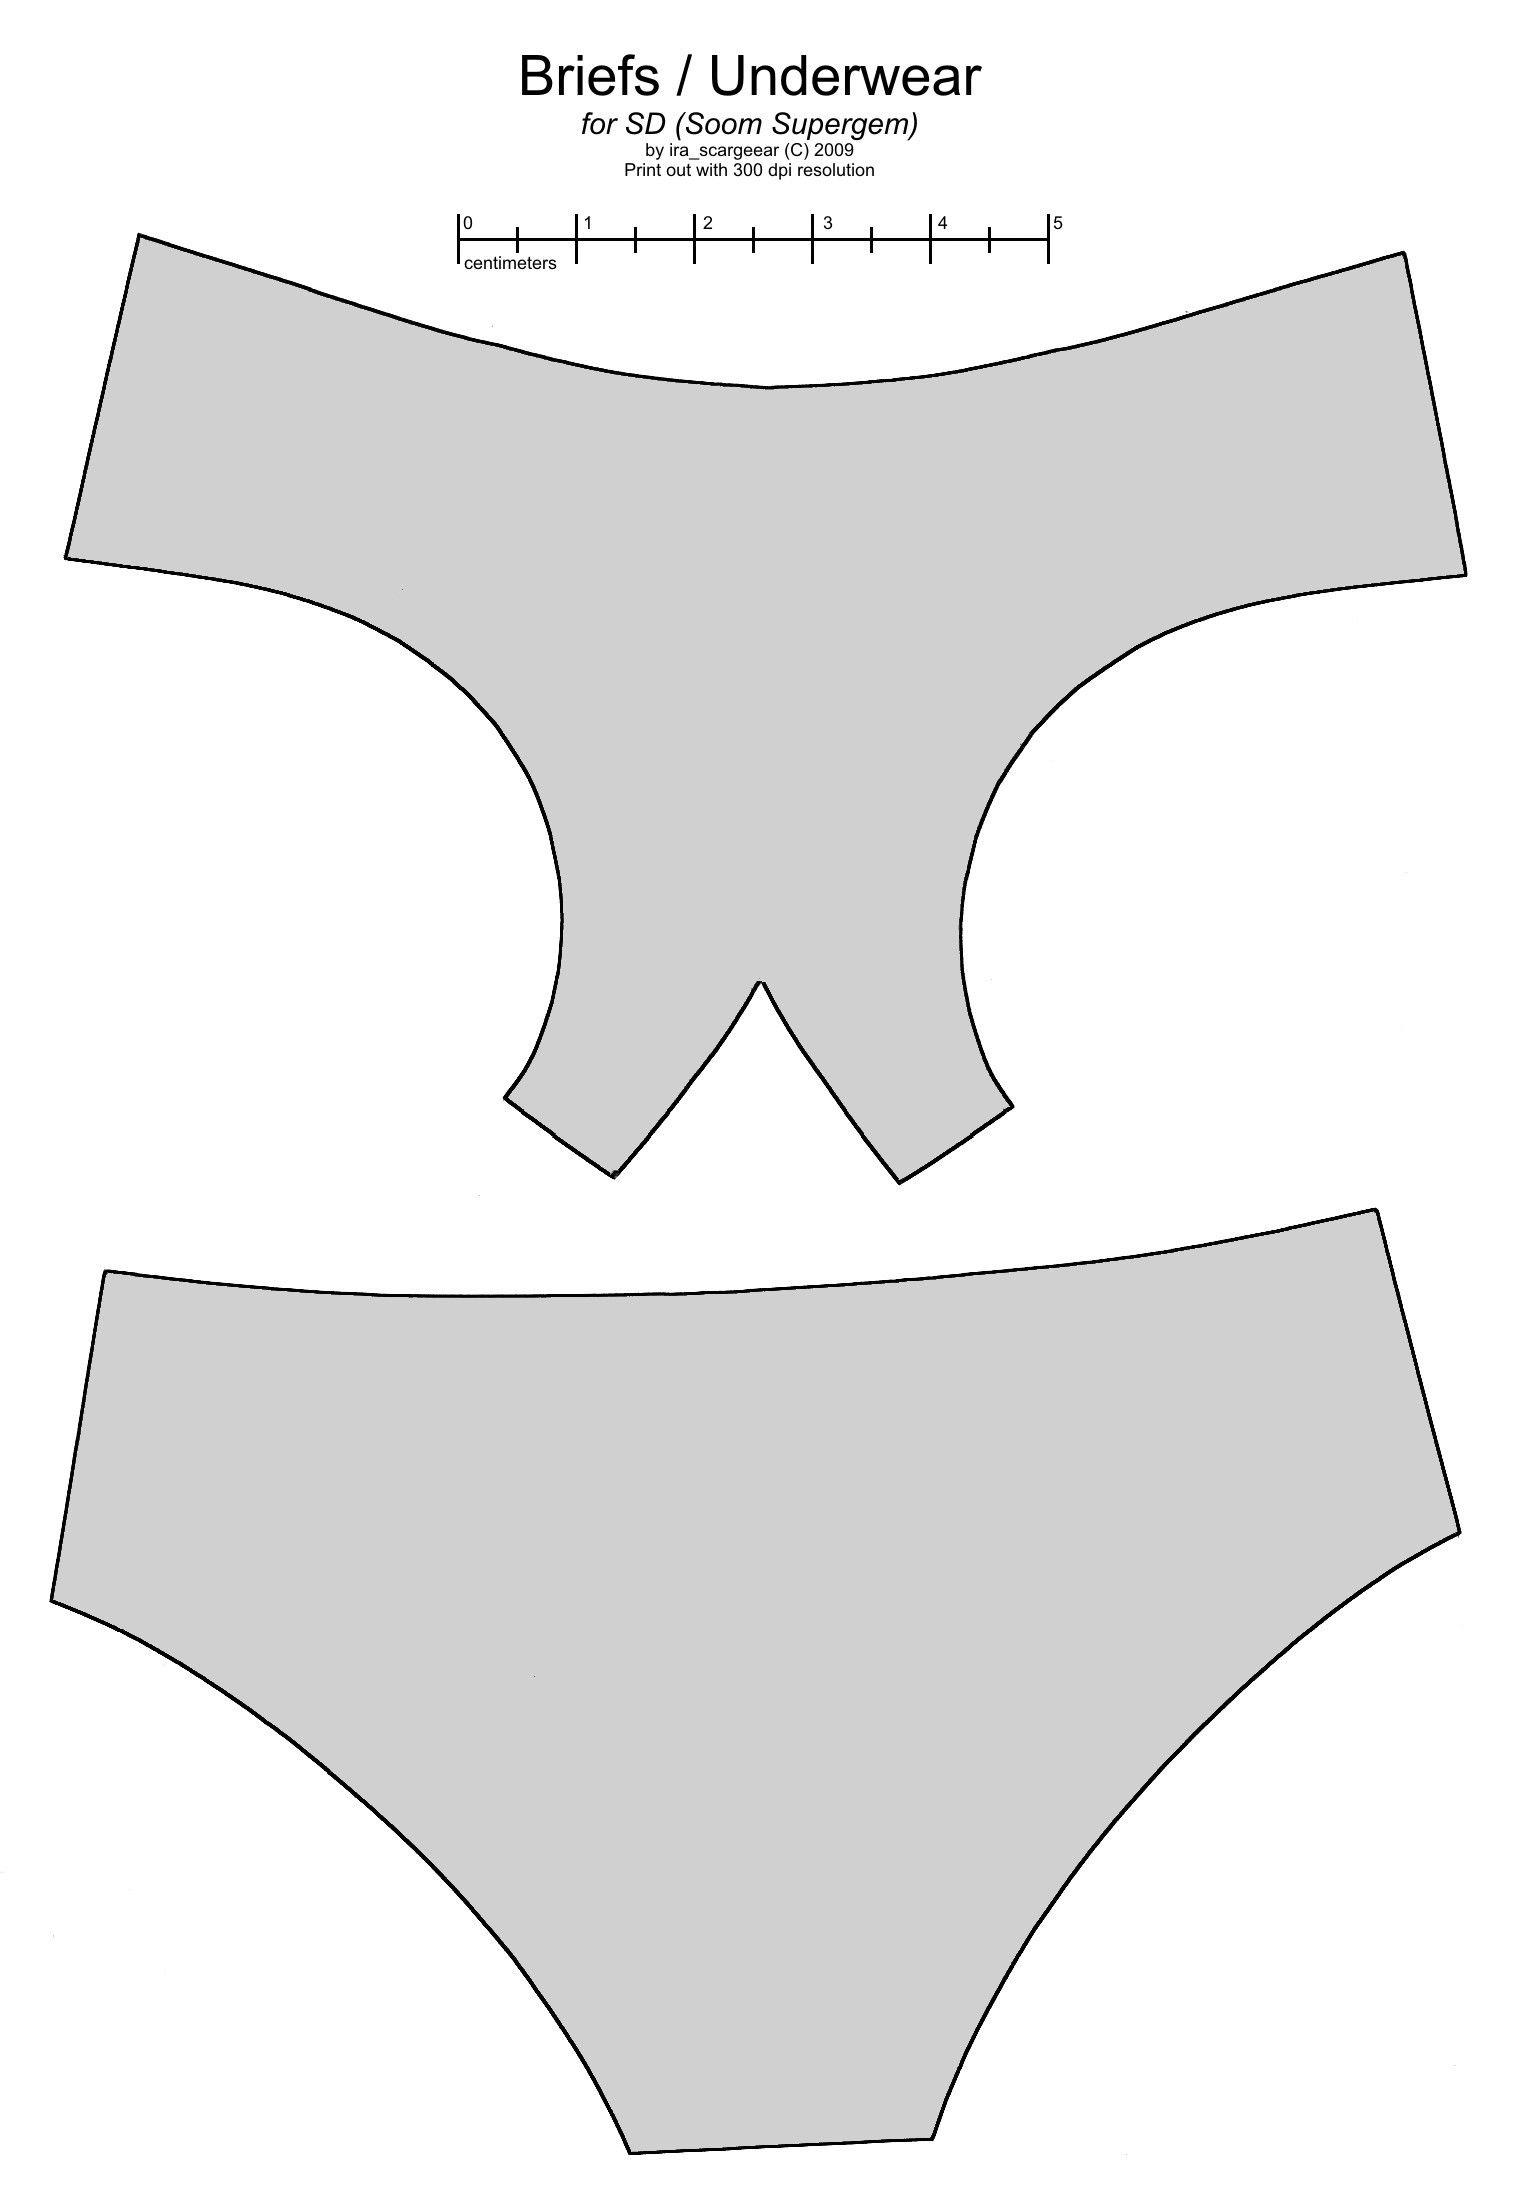 SD BJD (Soom Supergem) underwear by scargeear.deviantart.com on ...